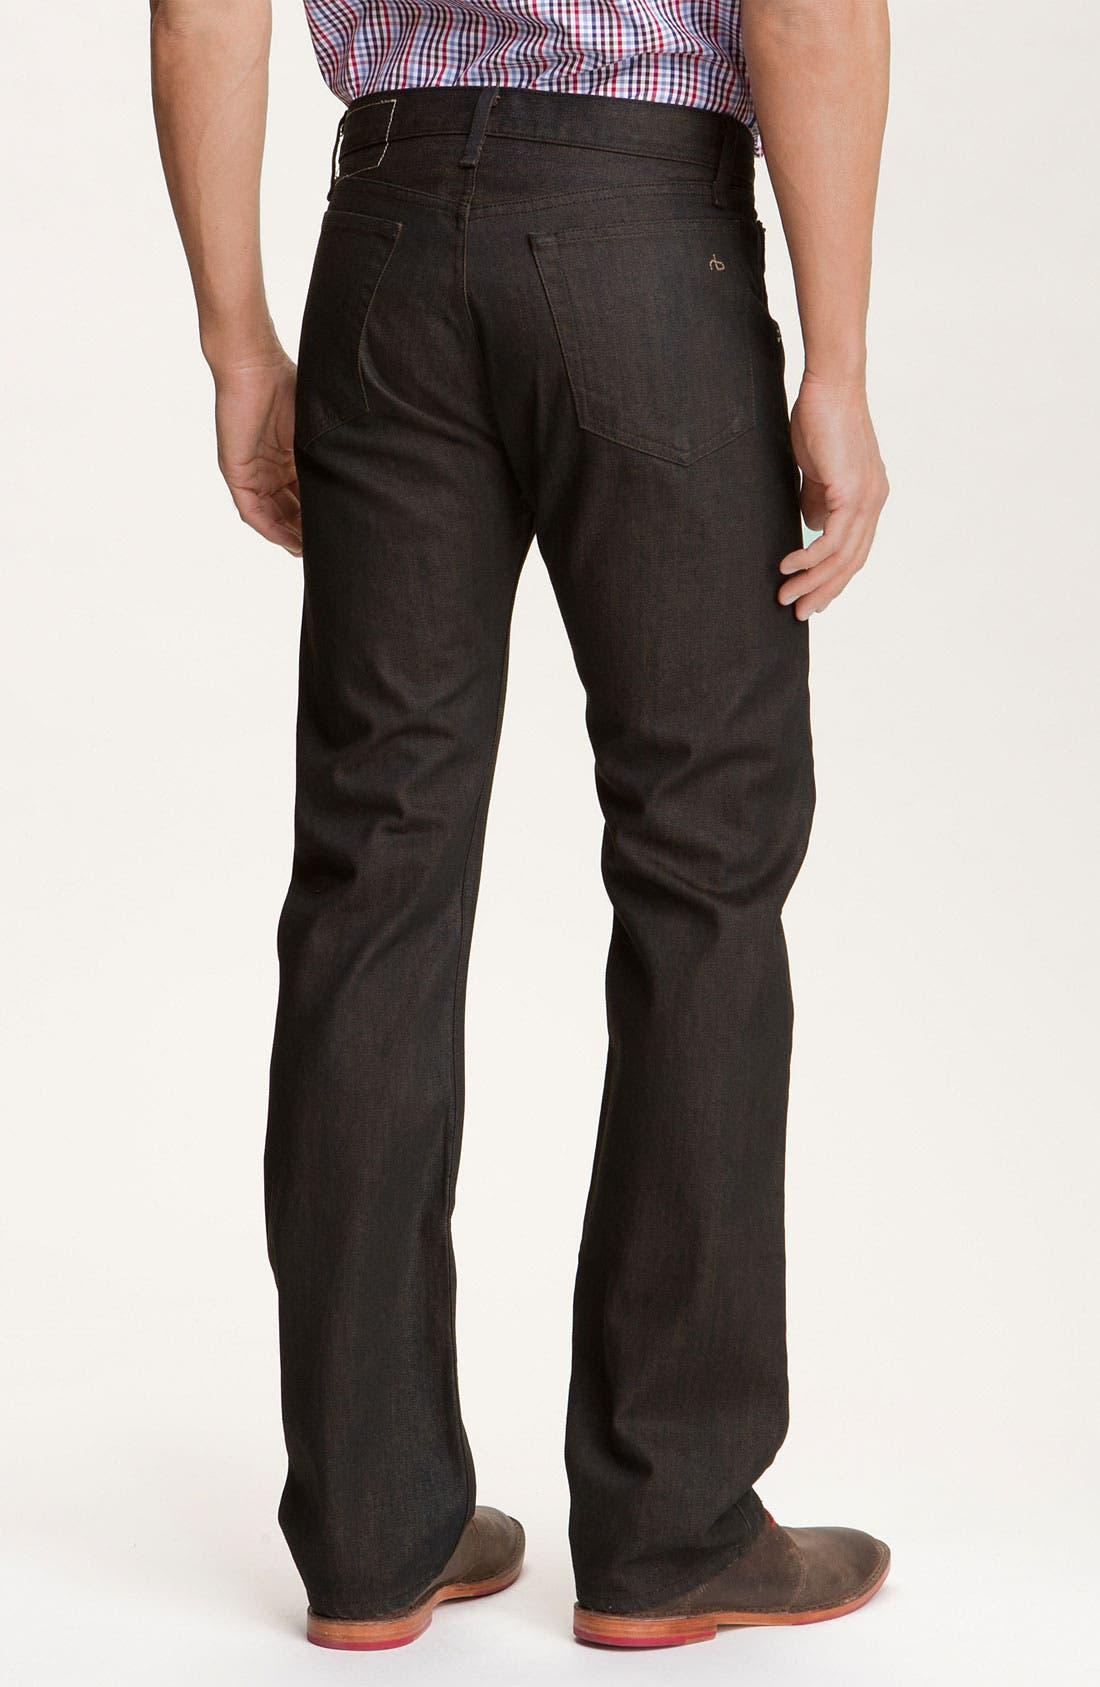 Alternate Image 1 Selected - rag & bone Straight Leg Jeans (Brown Resin Wash)